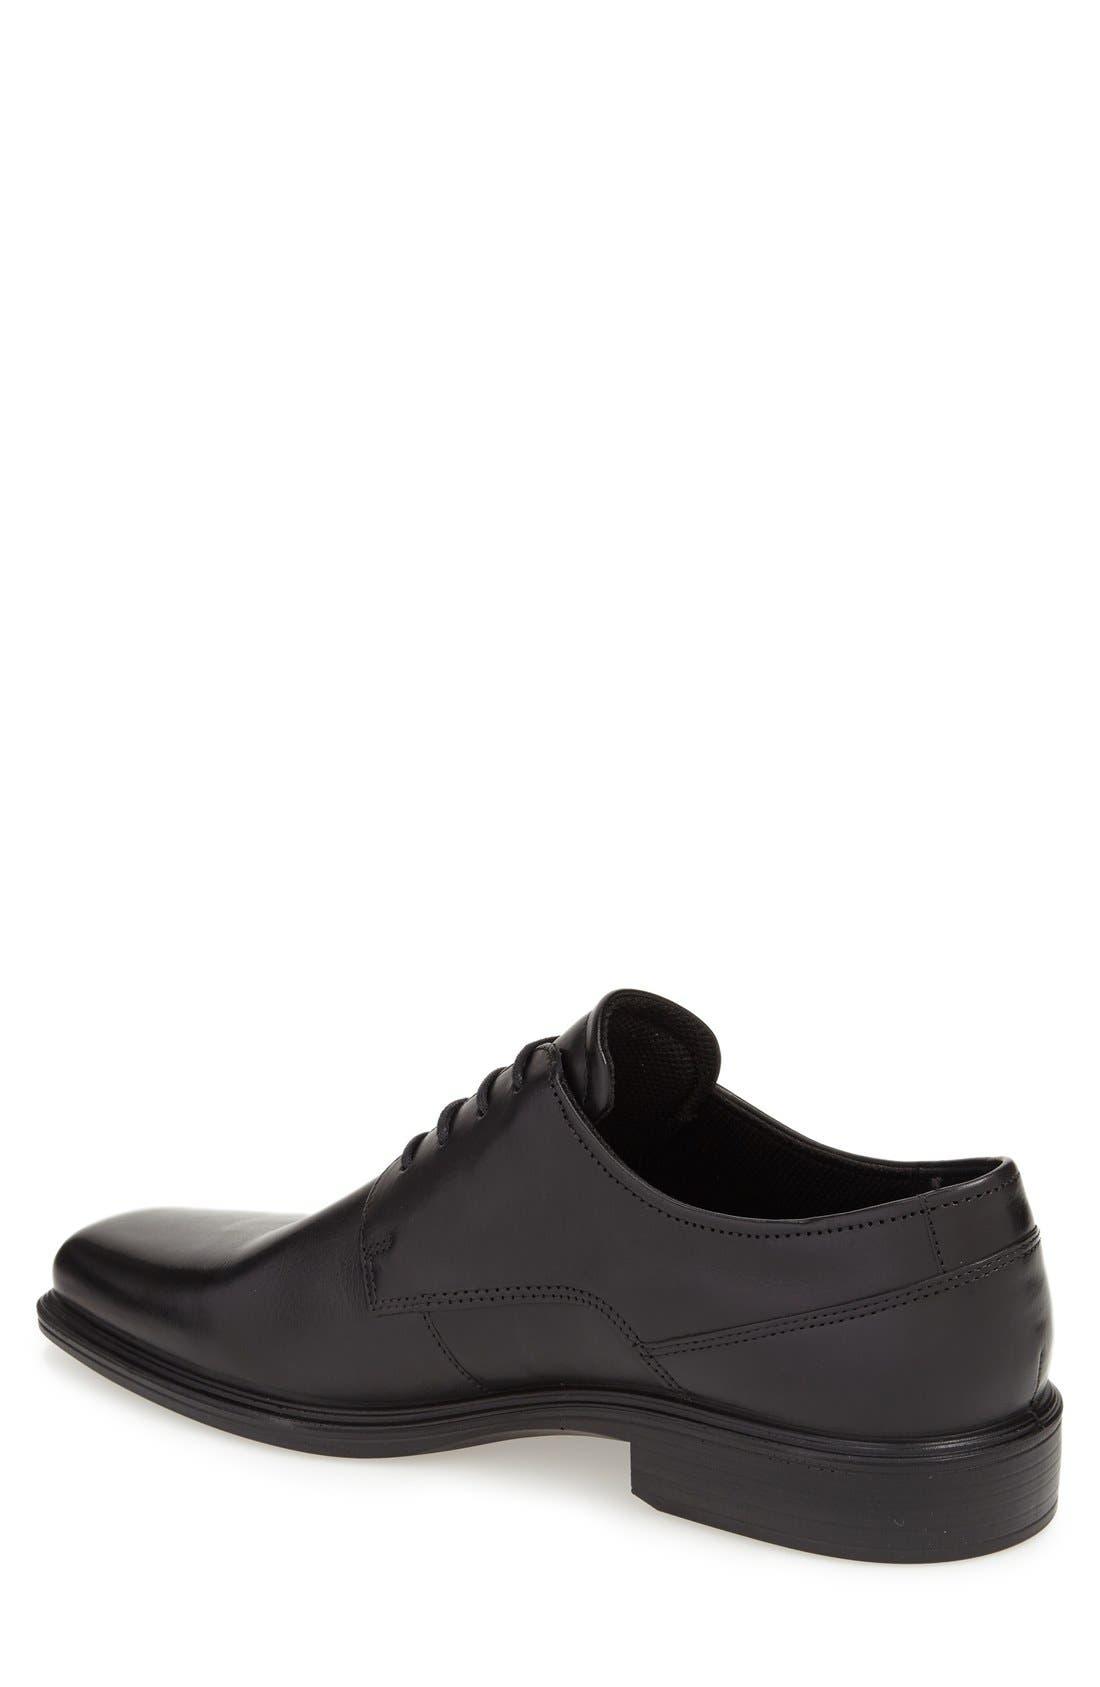 'Johannesburg' Plain Toe Derby,                             Alternate thumbnail 2, color,                             Black Leather